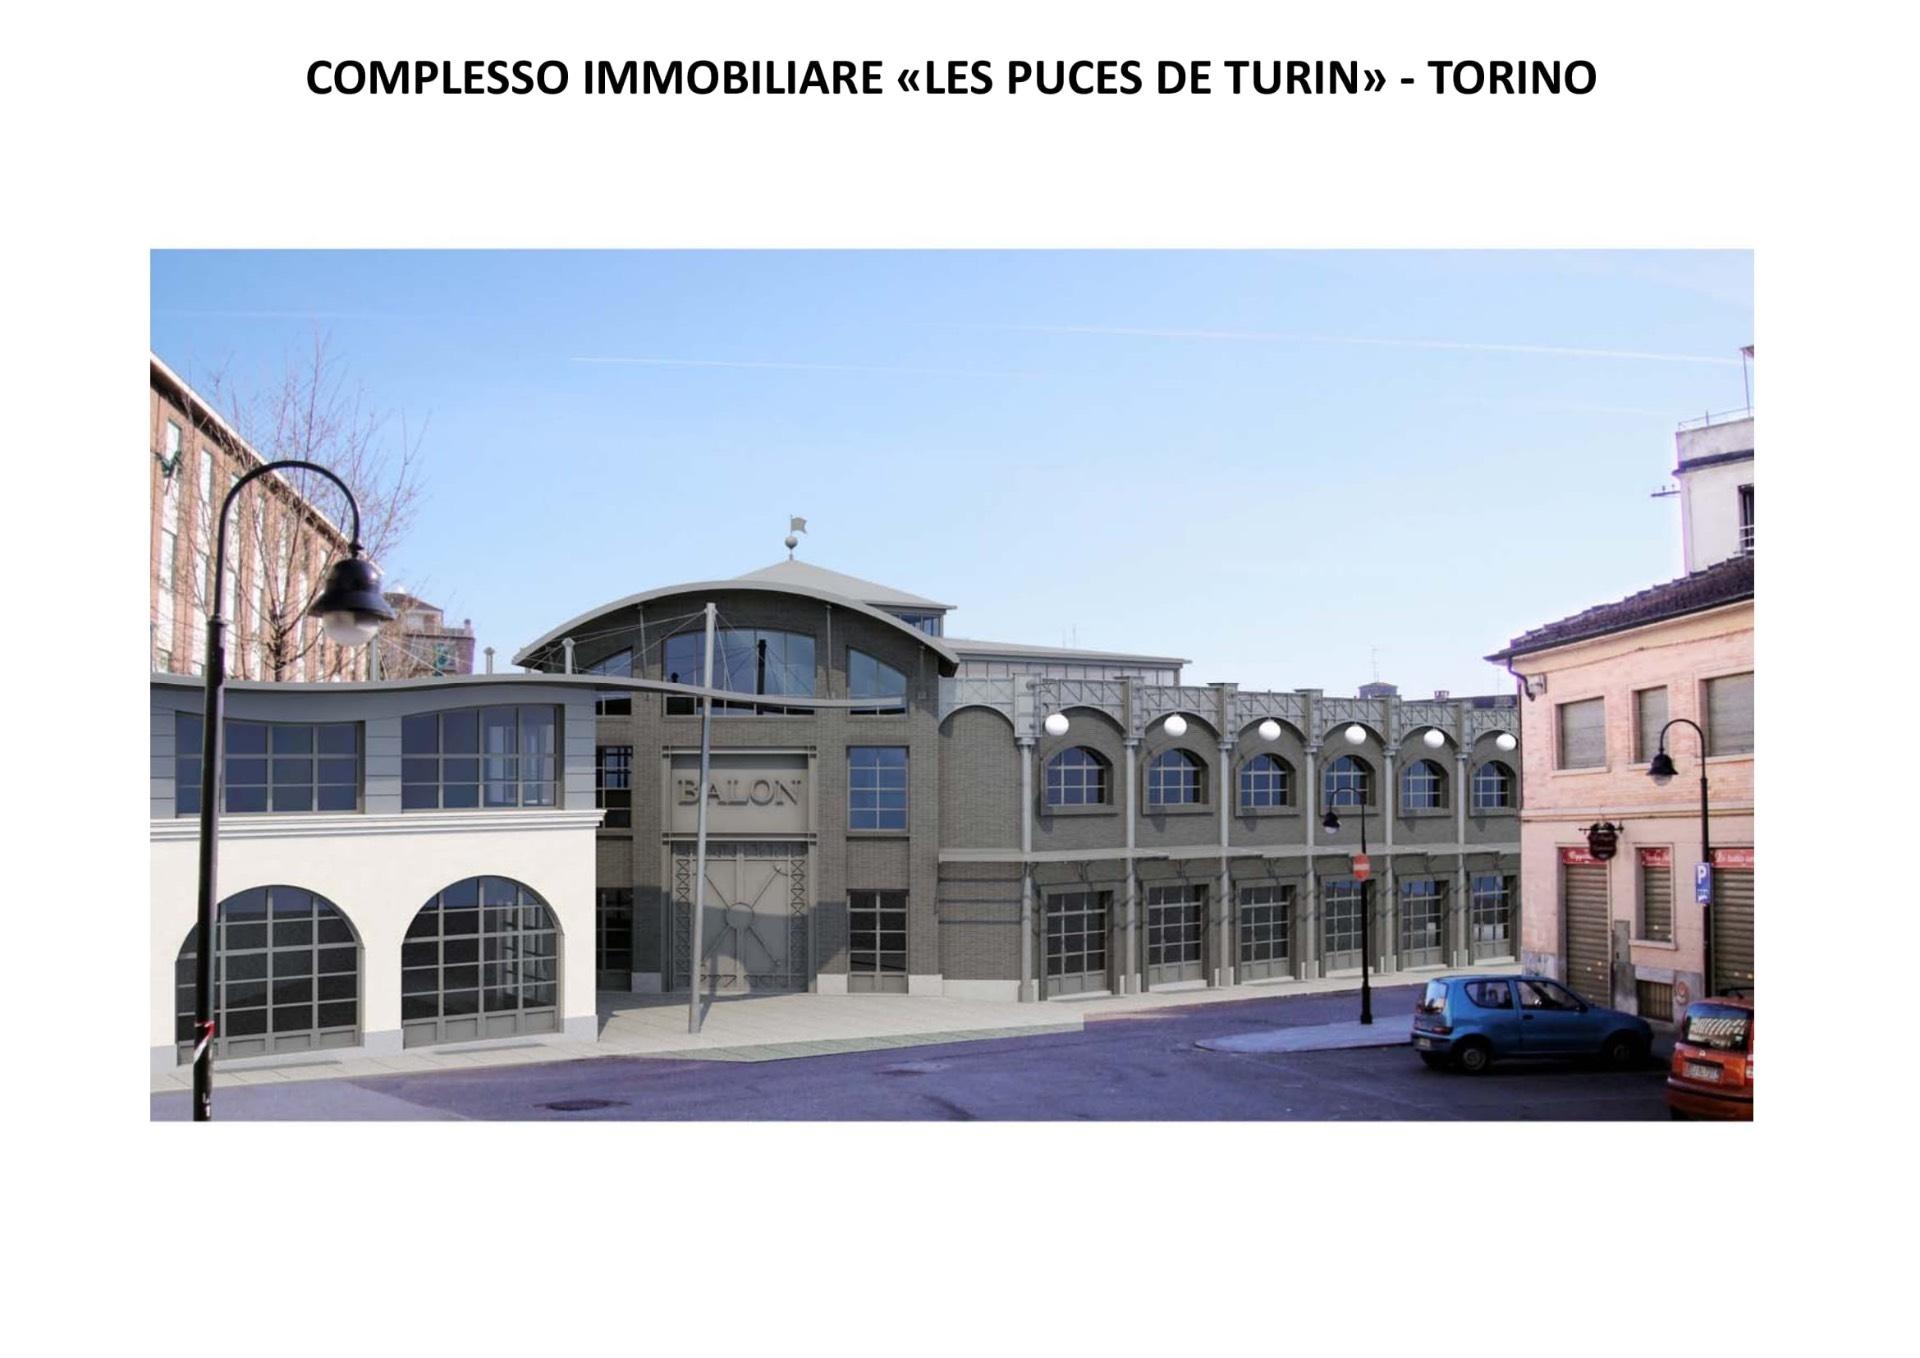 GaragePosti Auto in vendita a Torino  CasaSpecialeit